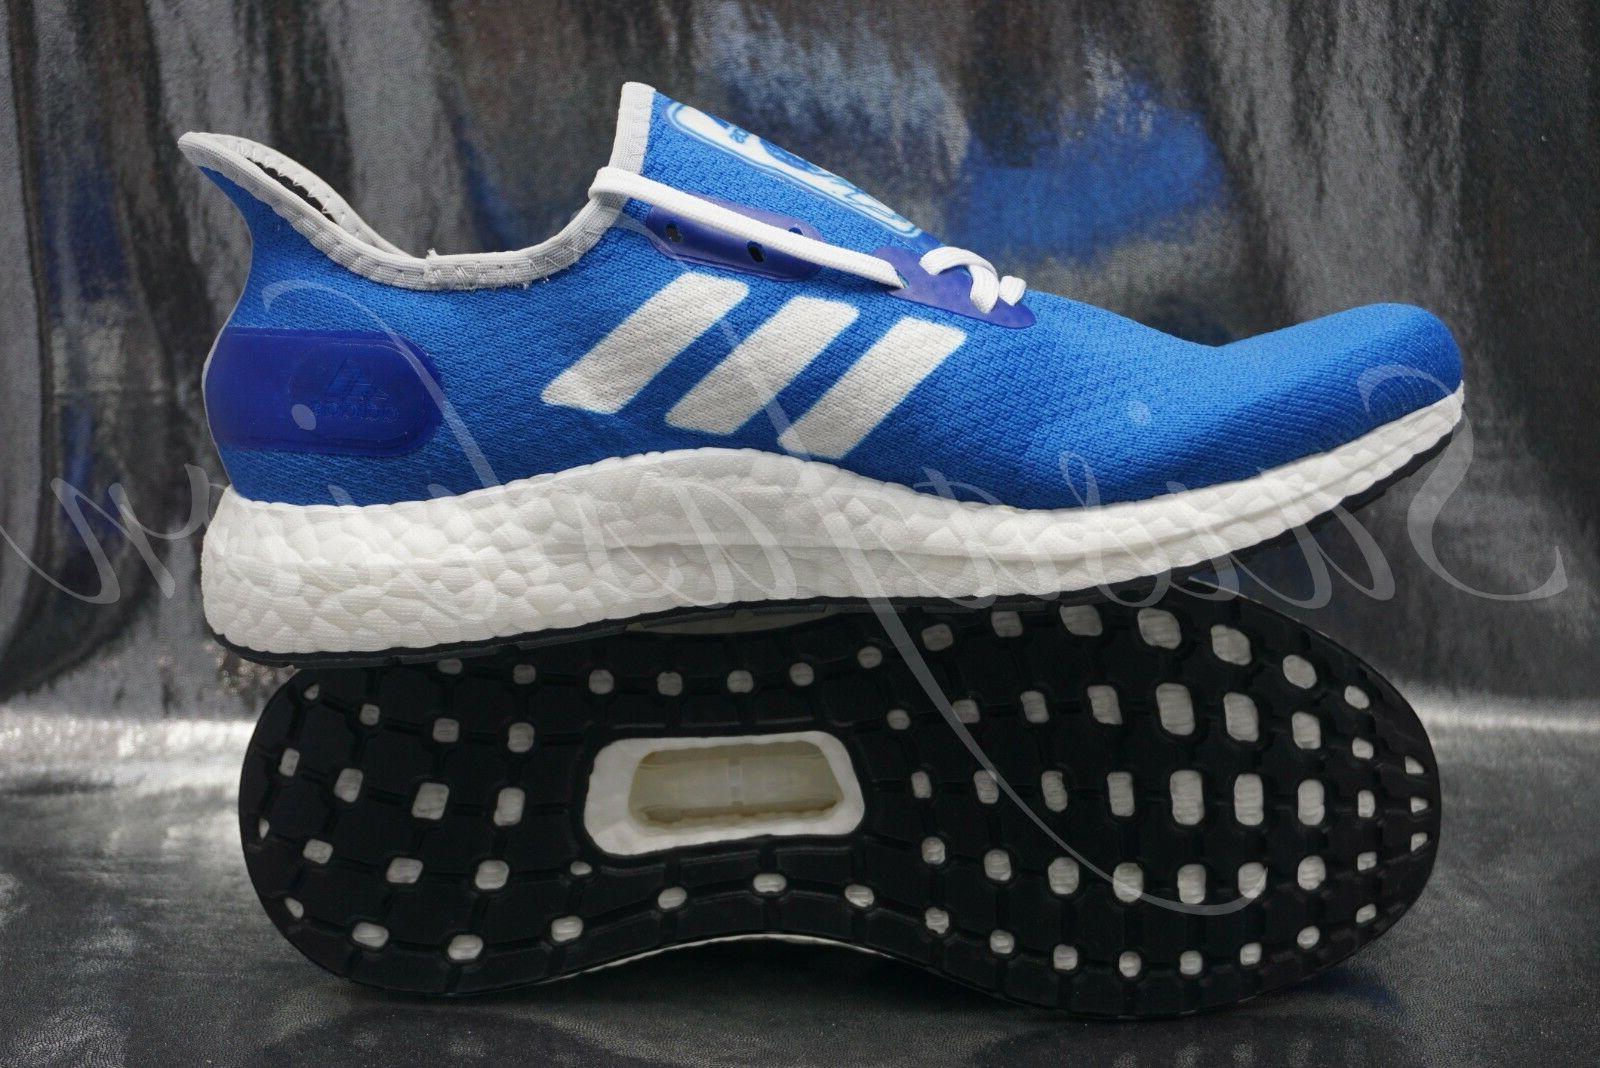 Adidas Speed Factory of 300 Men's 7